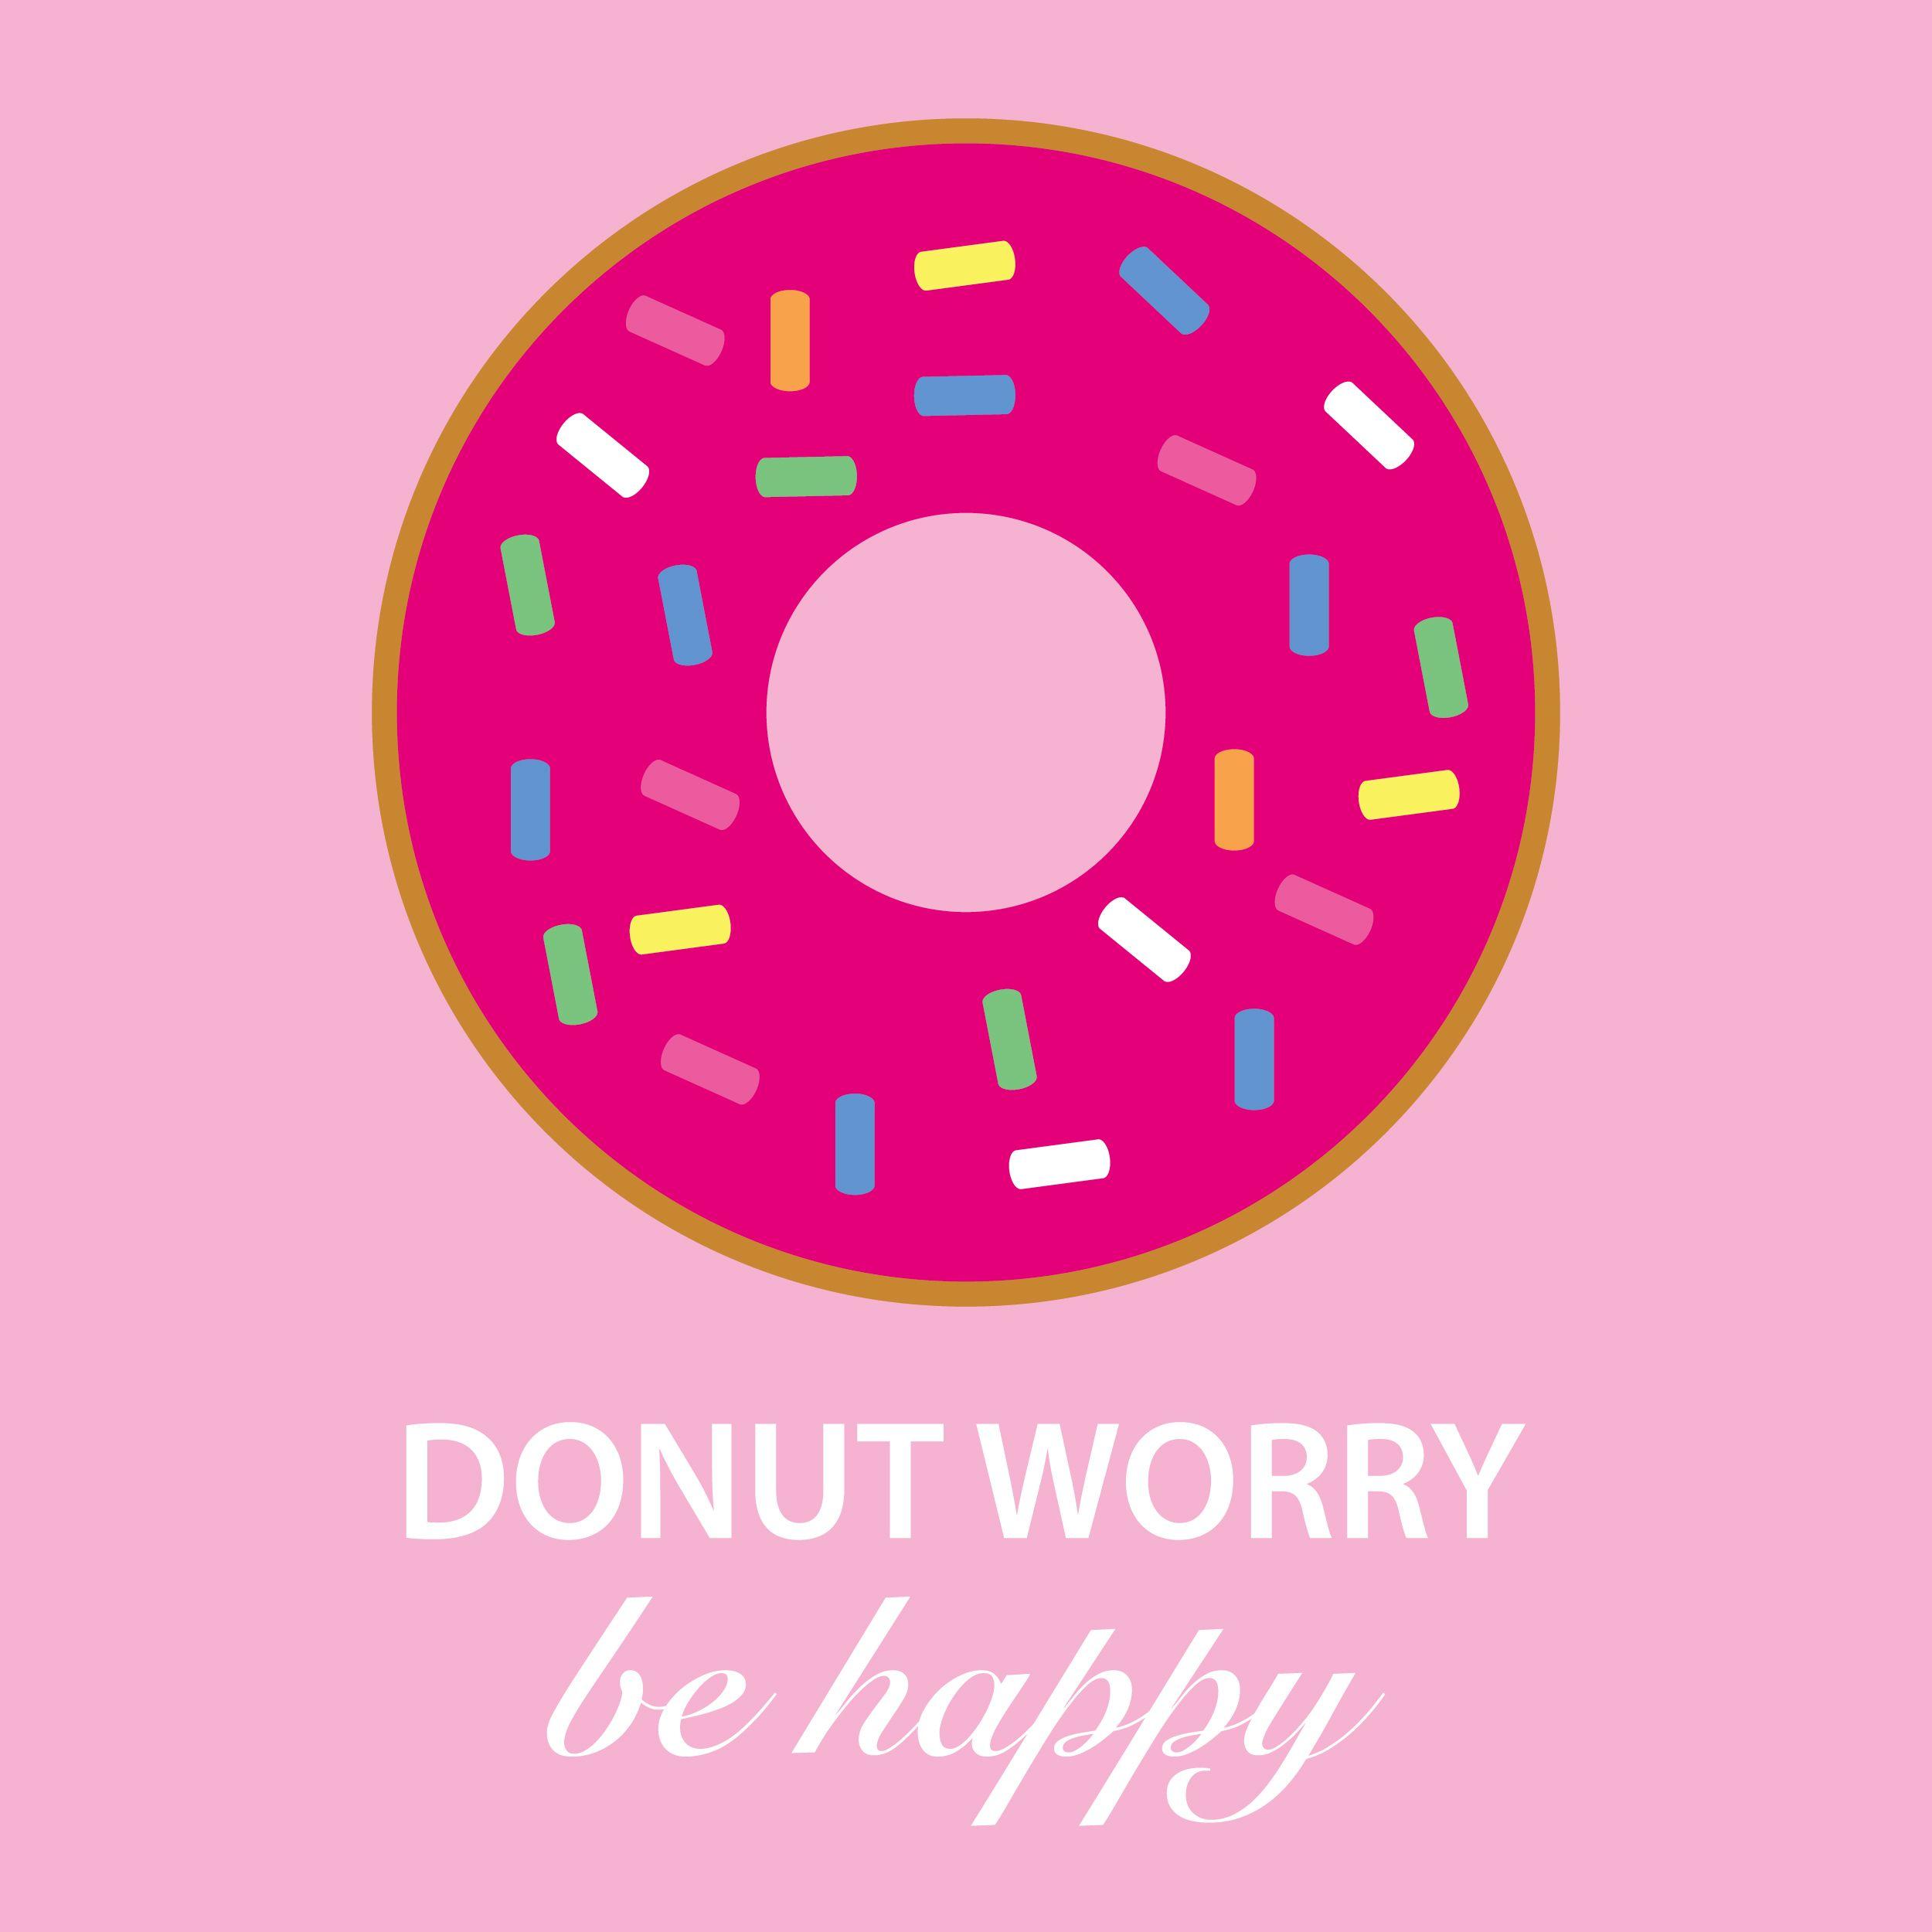 Donut Worry Free Wallpaper Download For Your Iphone Laptop Ipad Ideas De Fondos De Pantalla Cartel Fondo